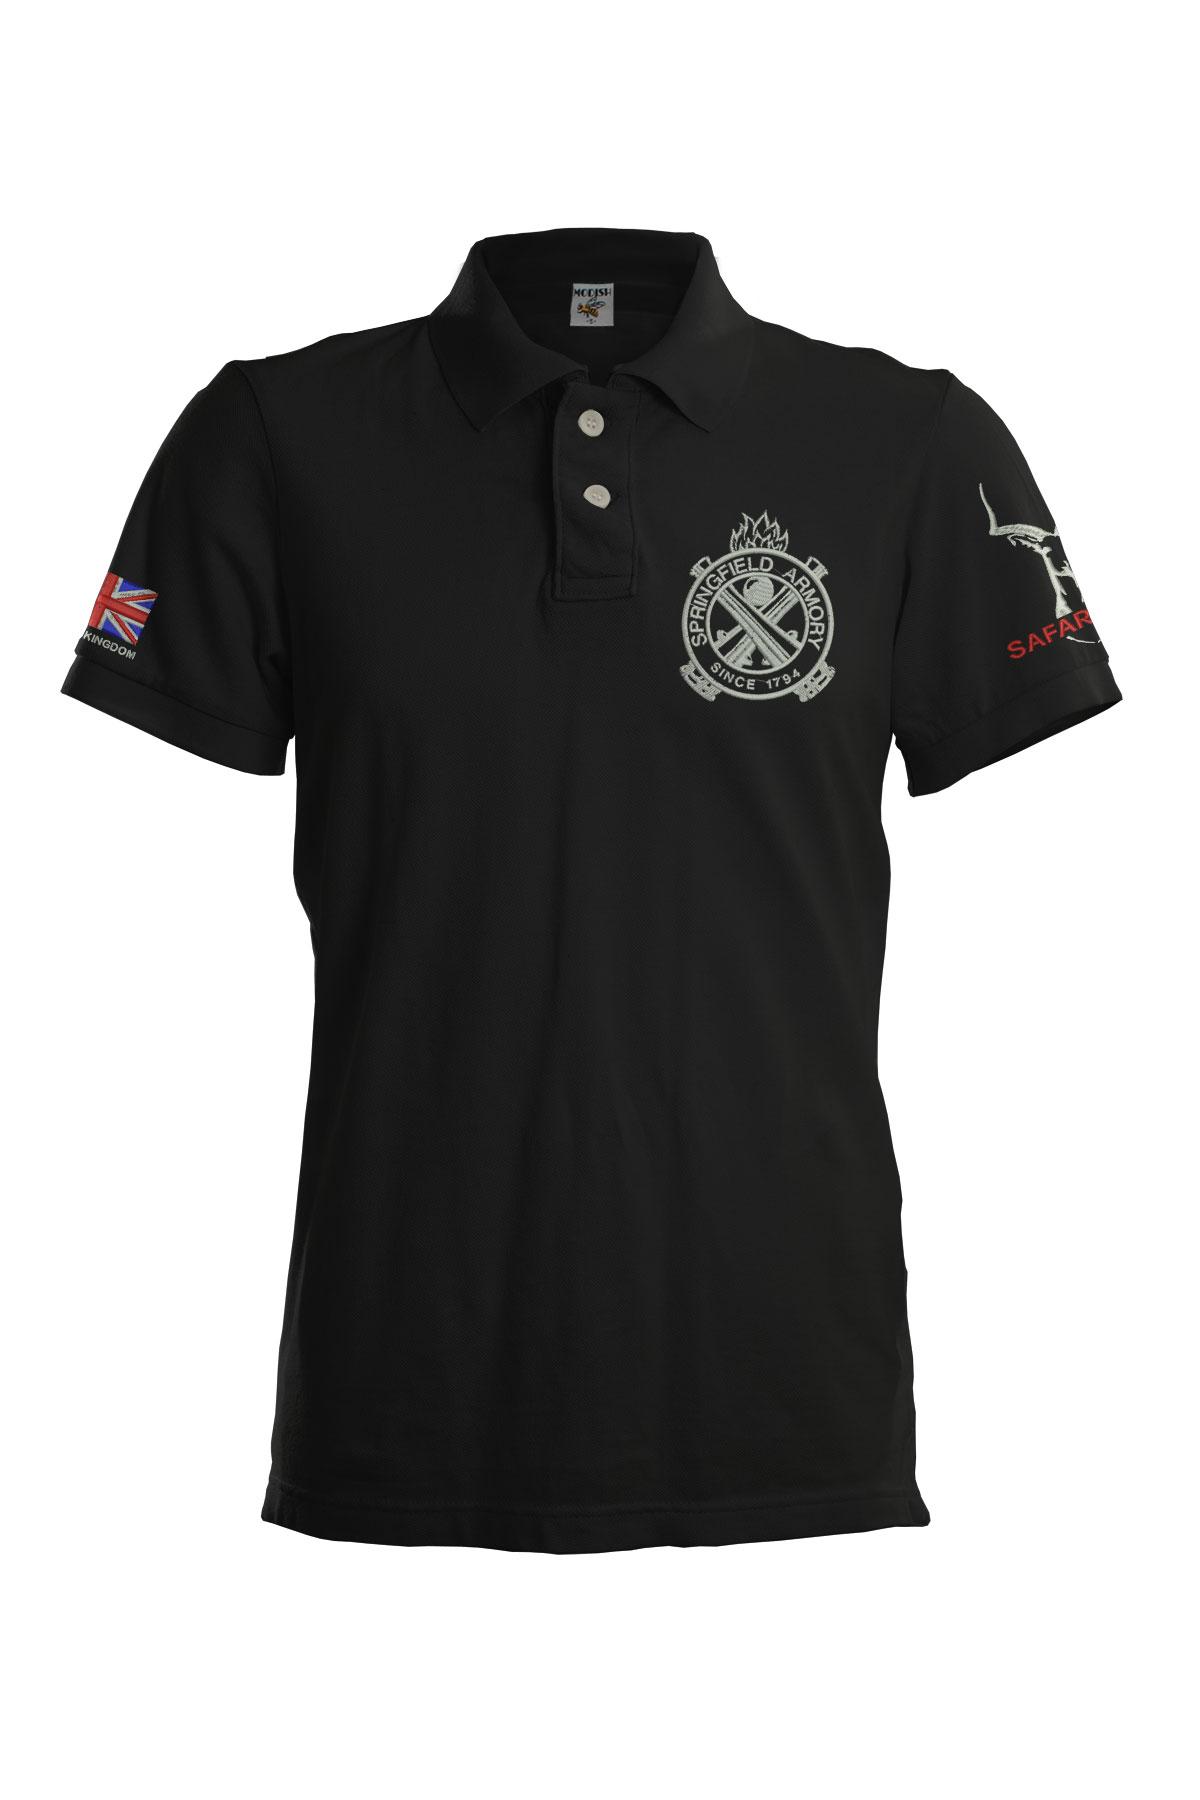 Bkk Bargains Springfield Armory Embroidered Polo Shirt Plus Custom